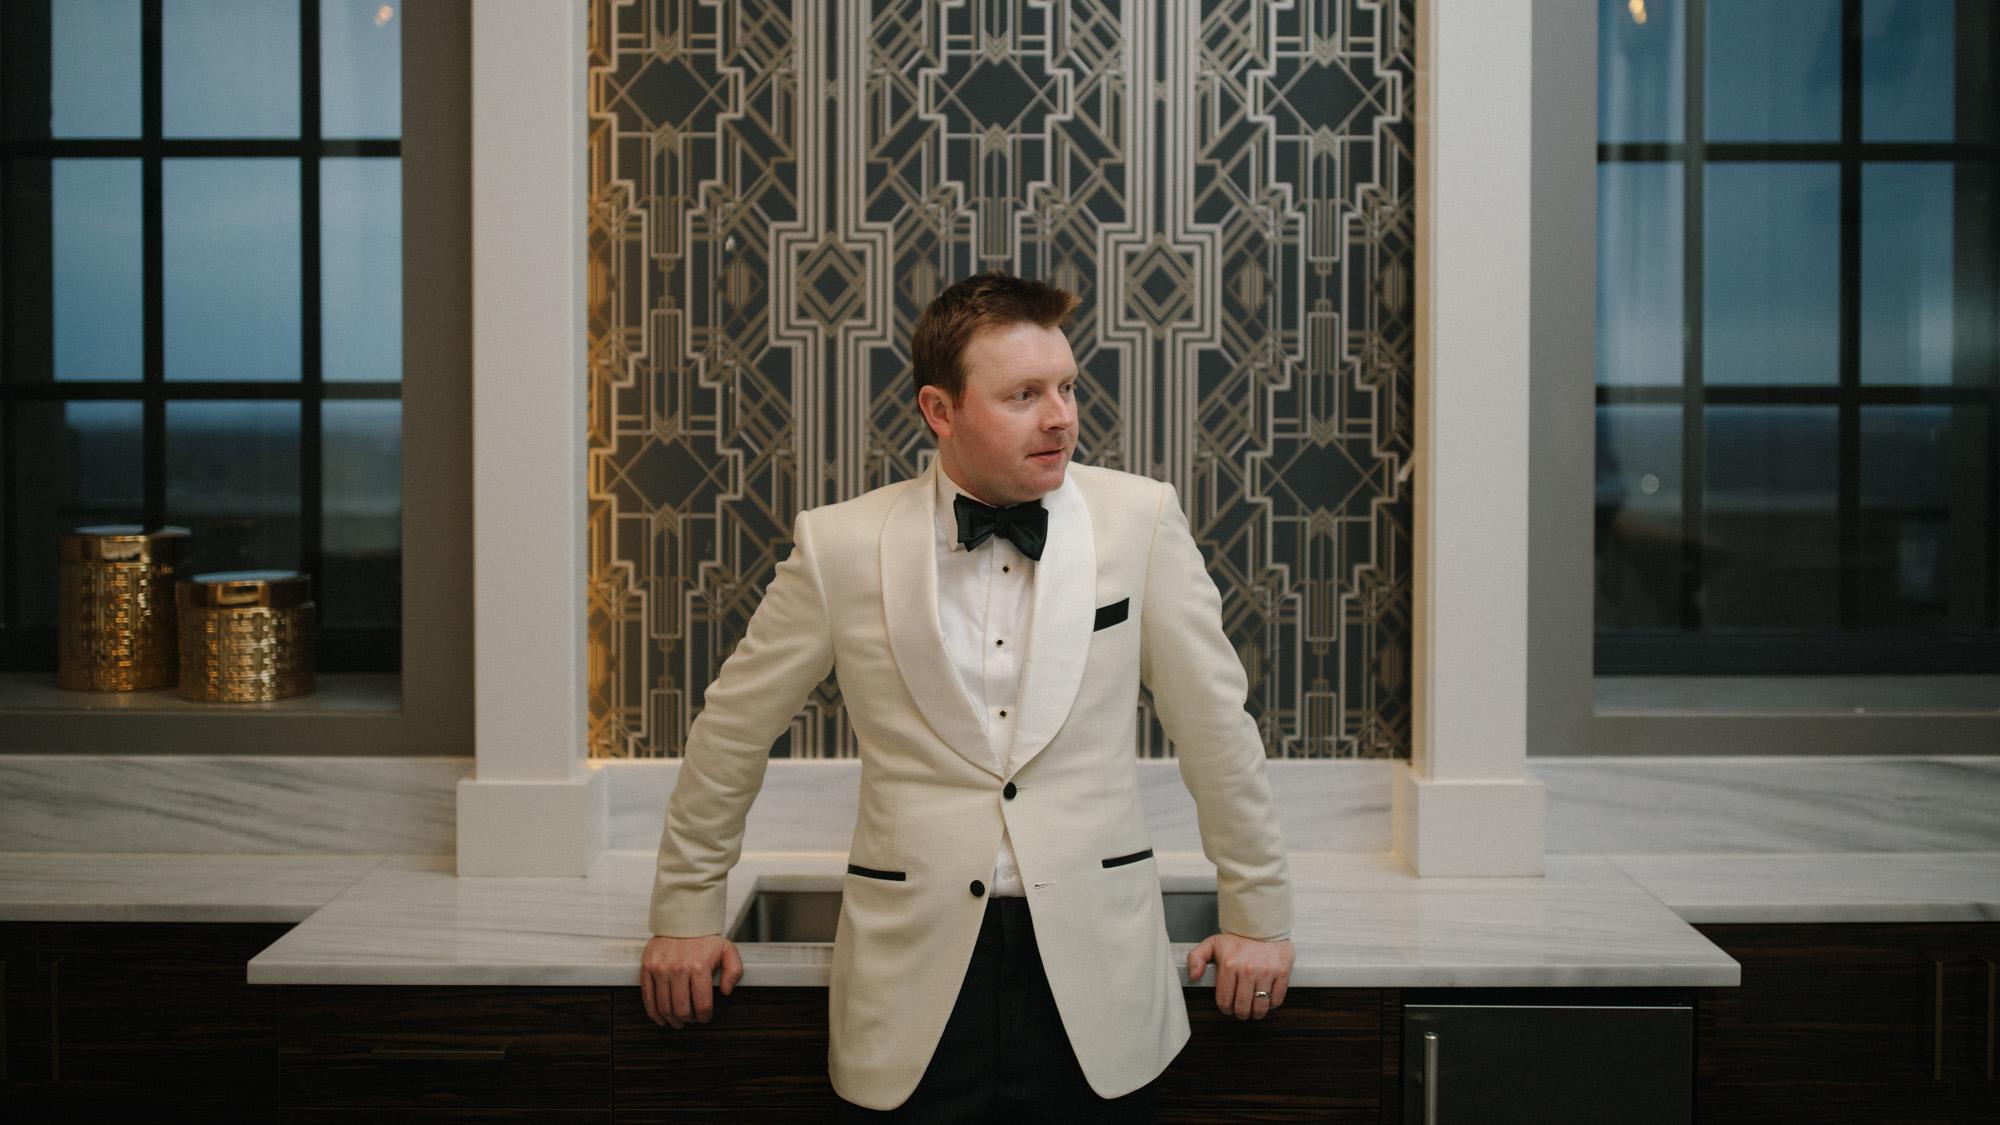 Alec_Vanderboom_kansas_city_hip_wedding_photos-0083.jpg